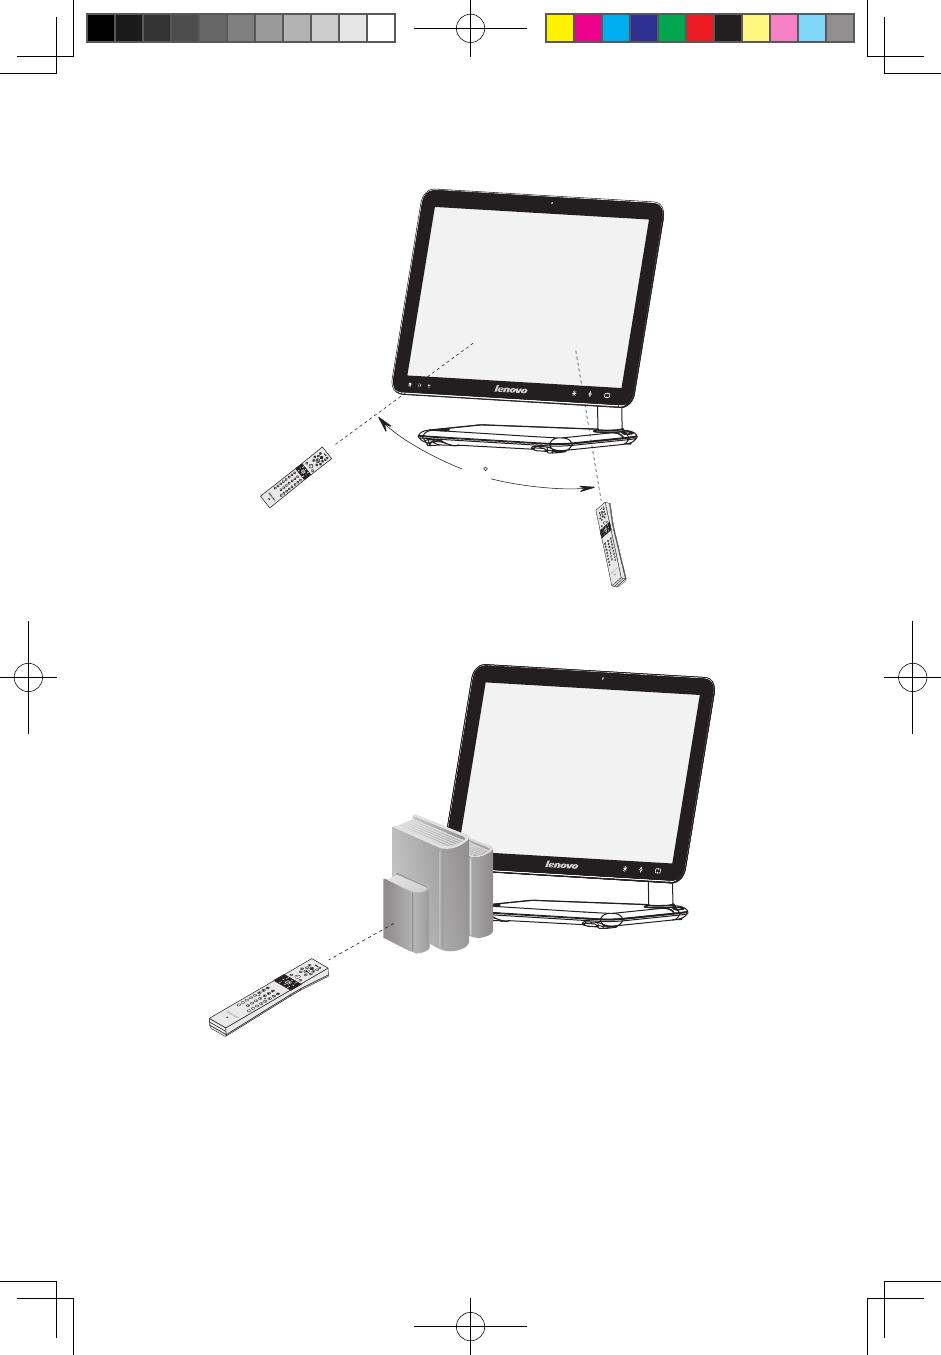 Lenovo Ideacentre A300 User Guide V1.0 Manual Idea Centre